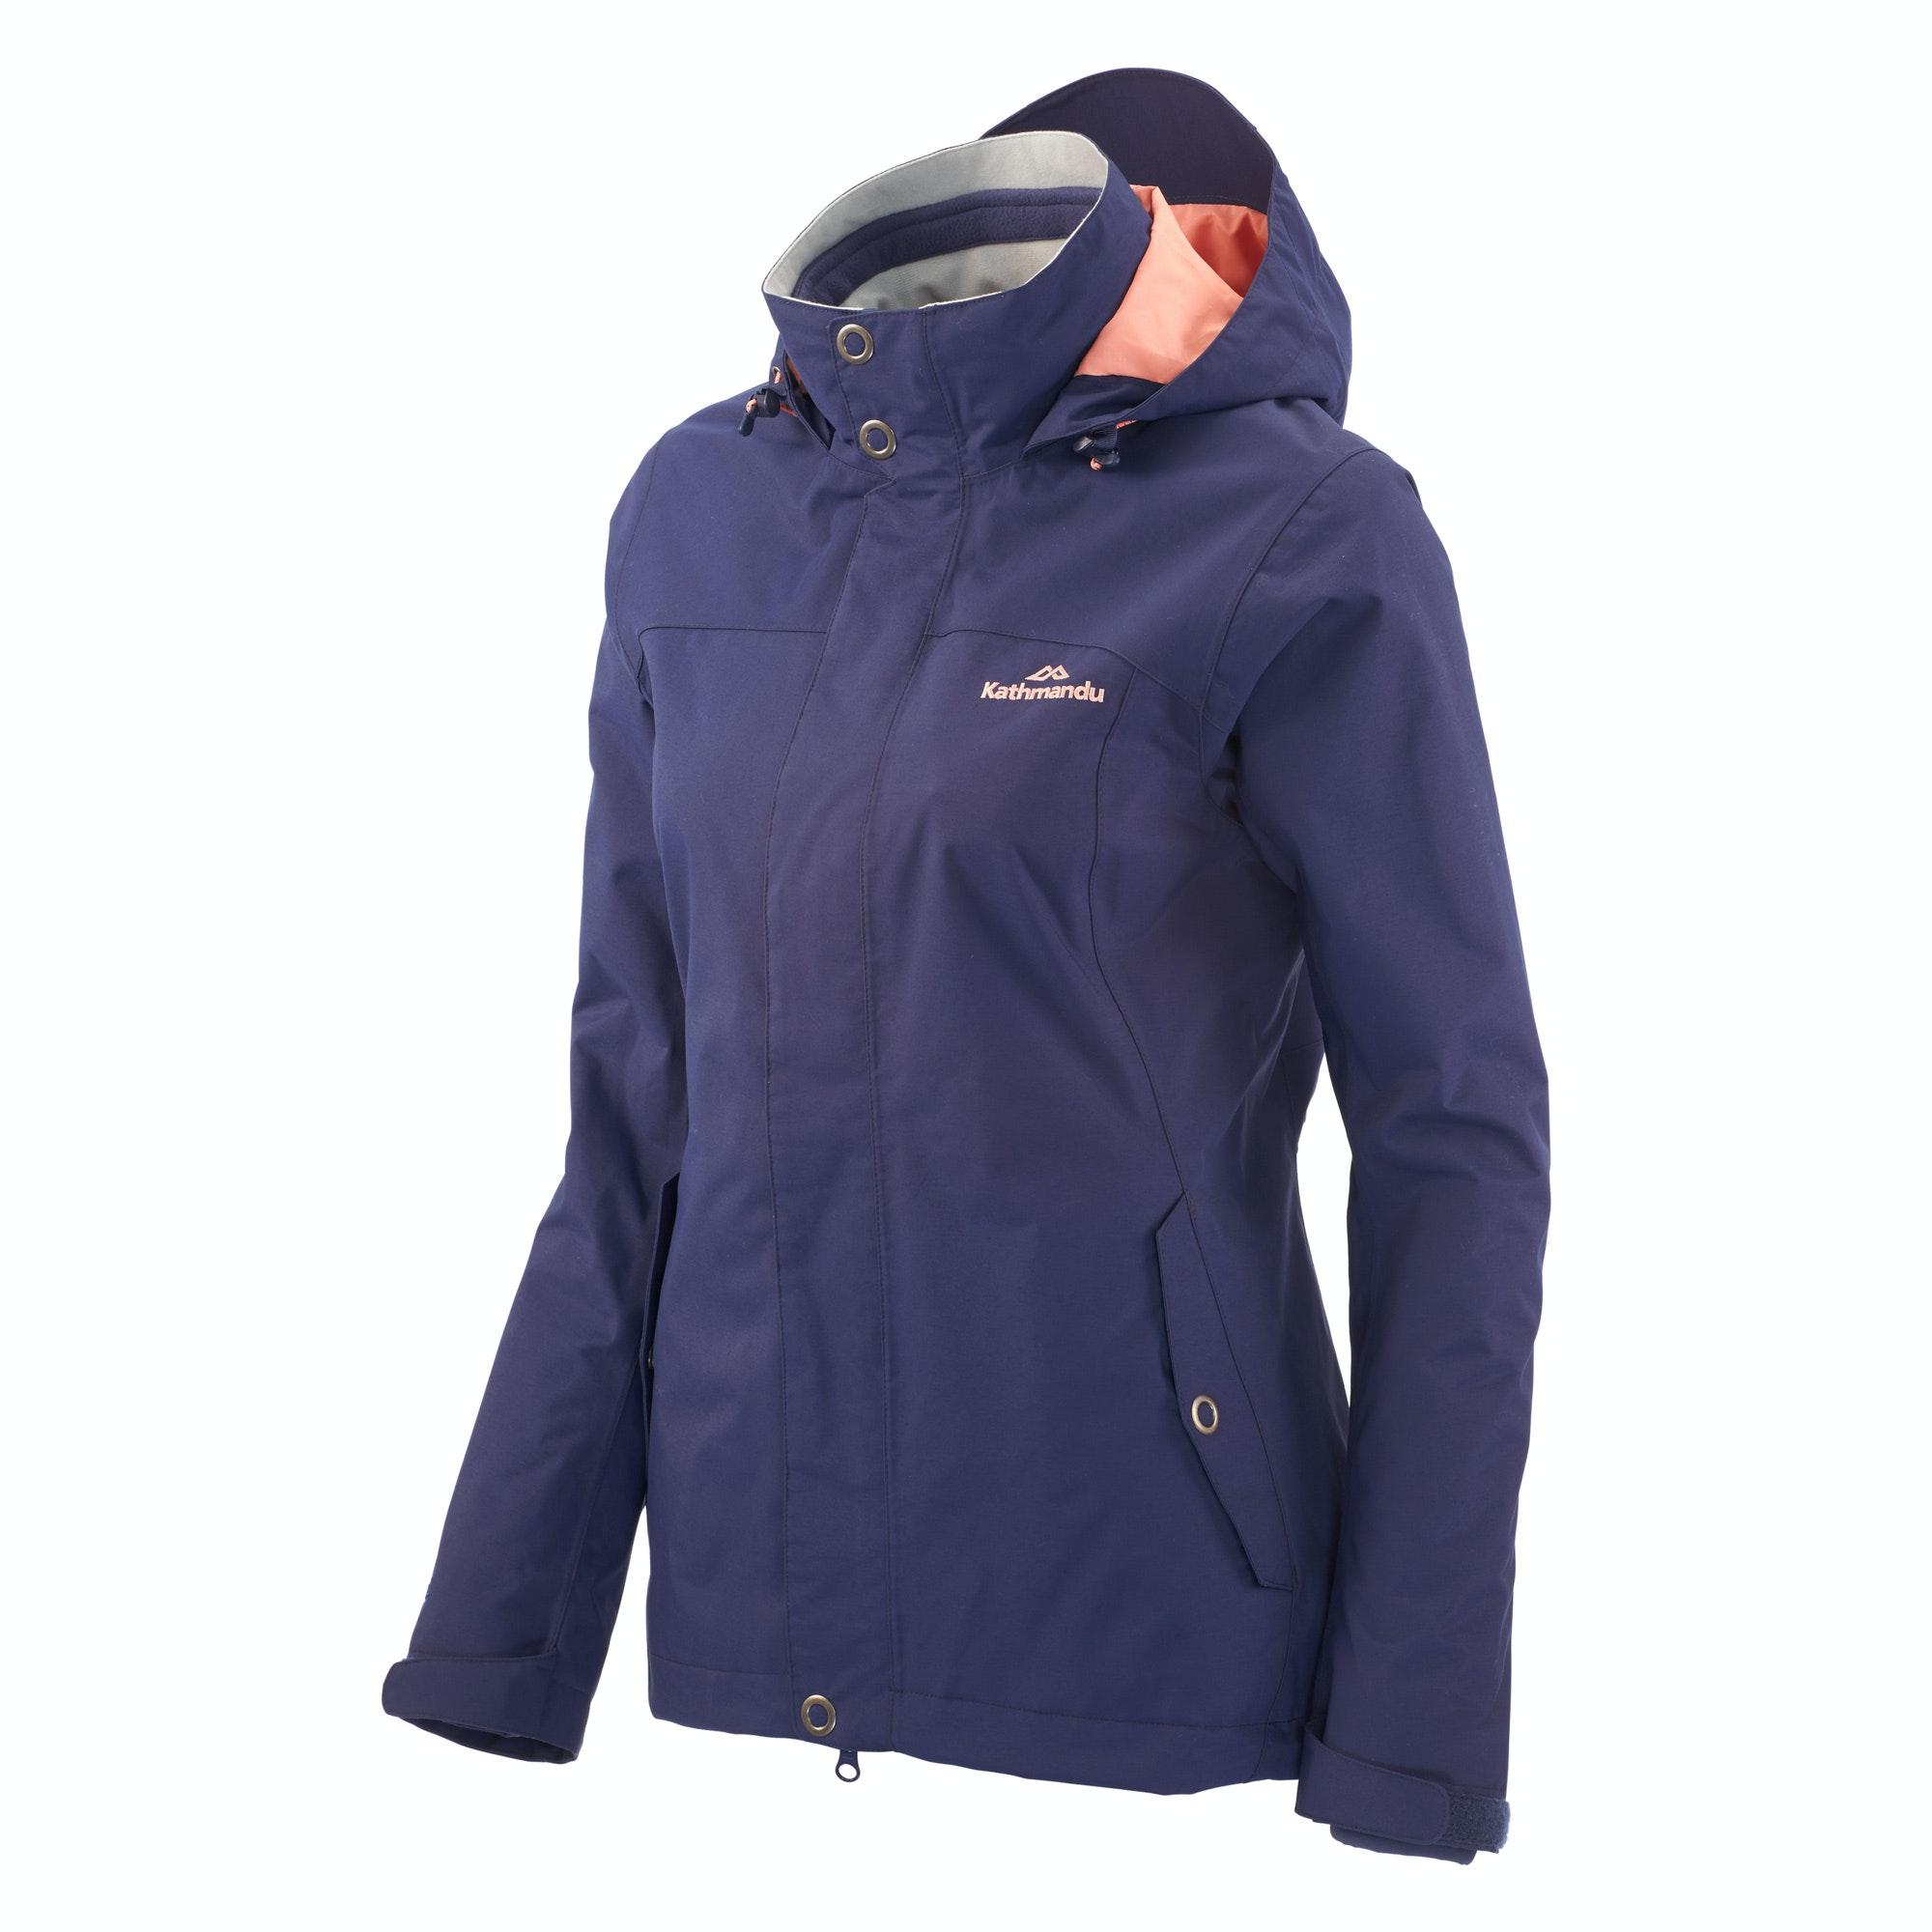 3 in 1 womens waterproof jacket